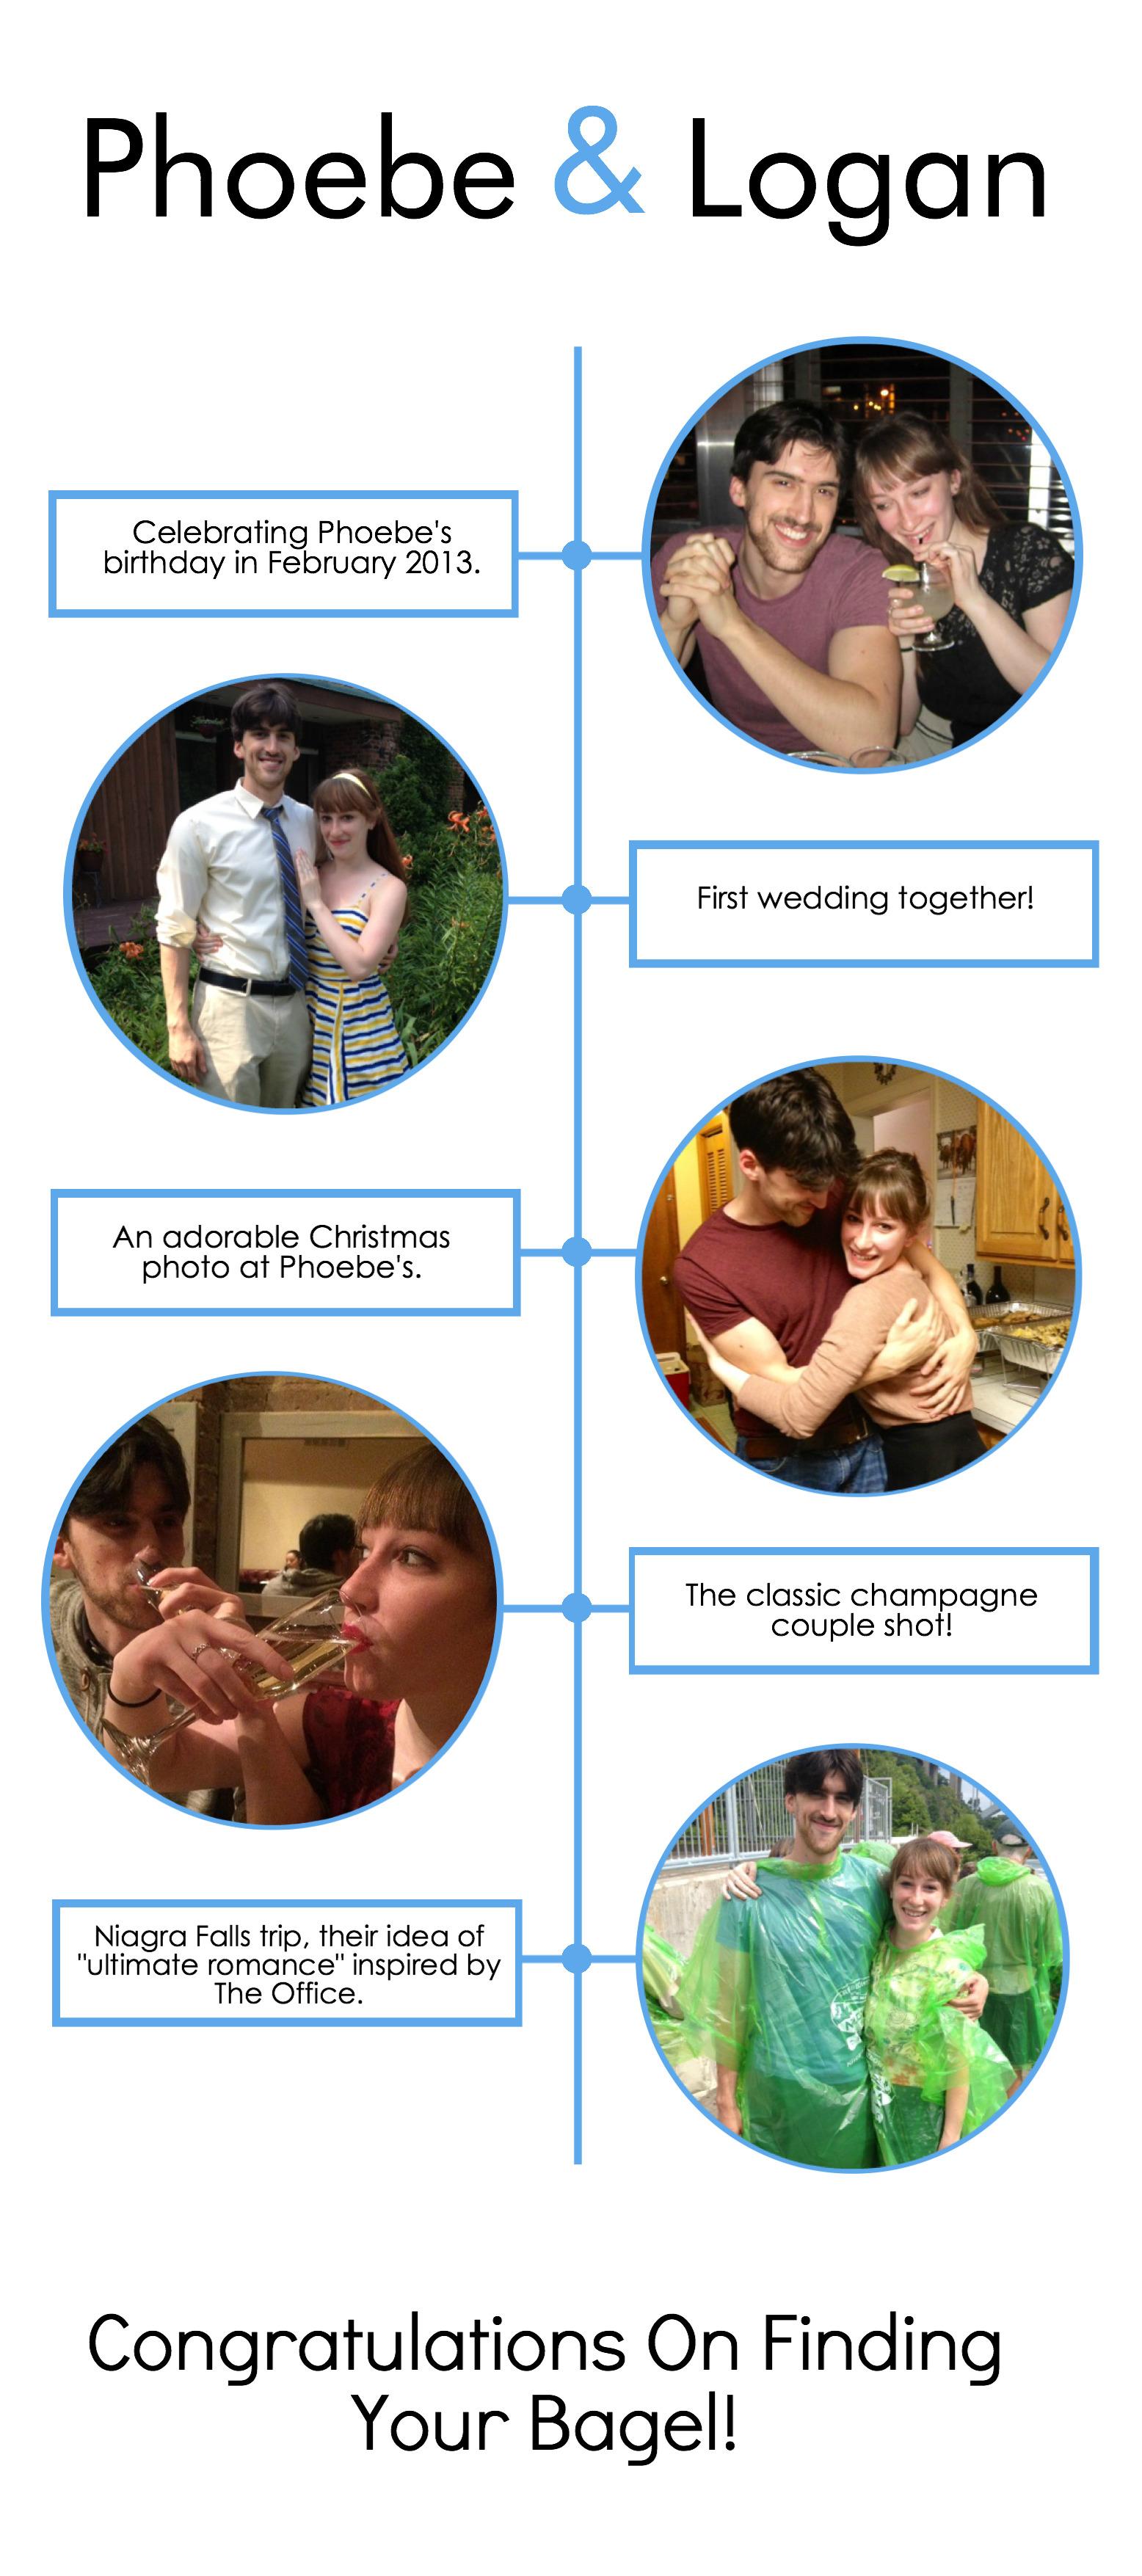 venezuela dating and marriage customs